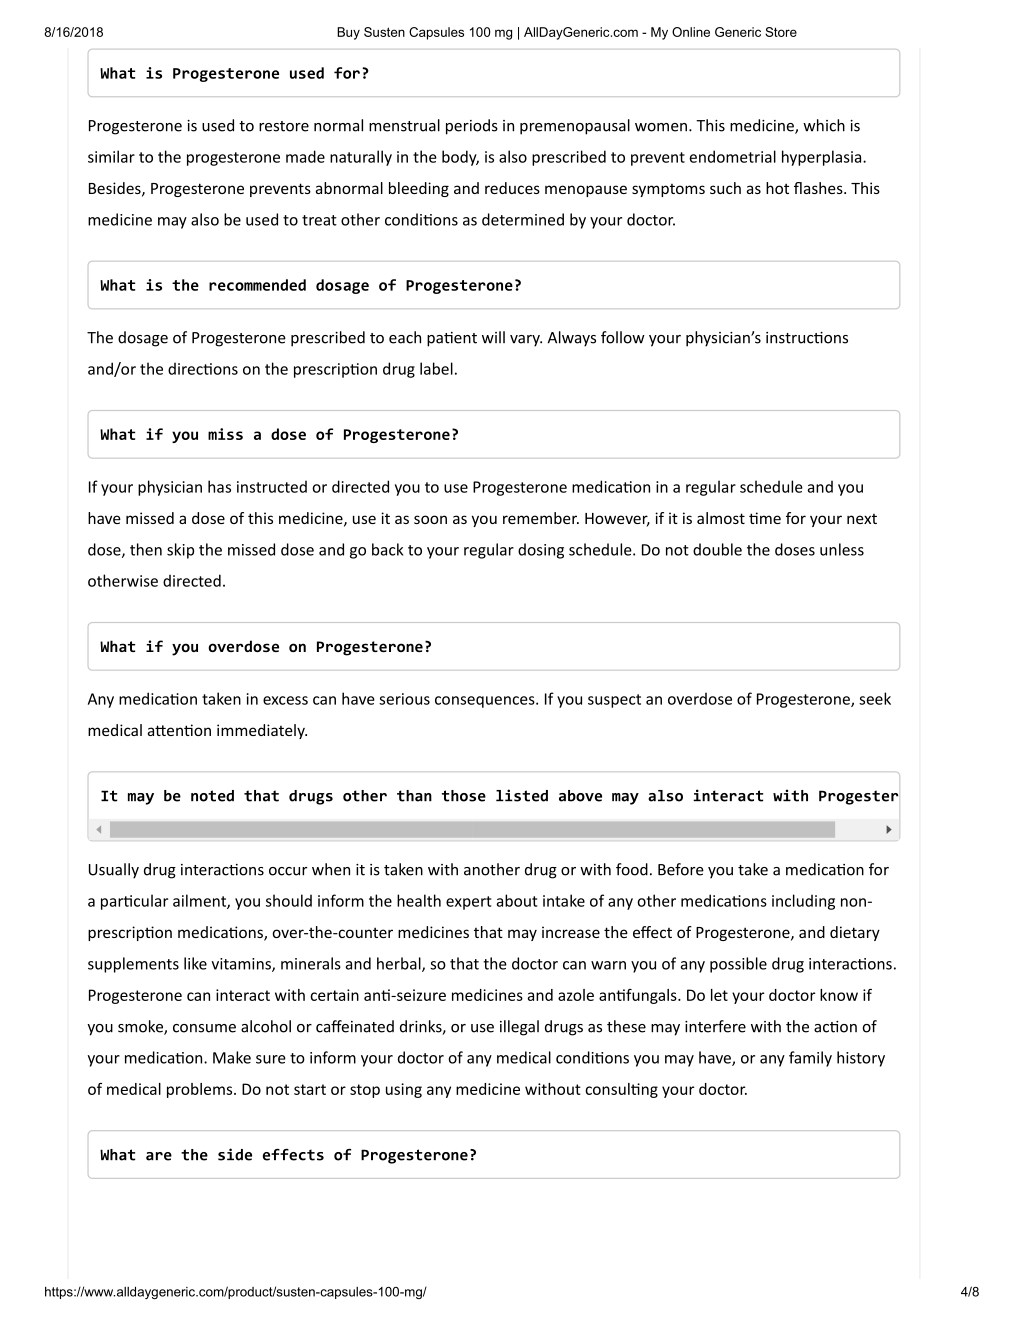 PPT - Susten Capsules 100 mg PowerPoint Presentation - ID